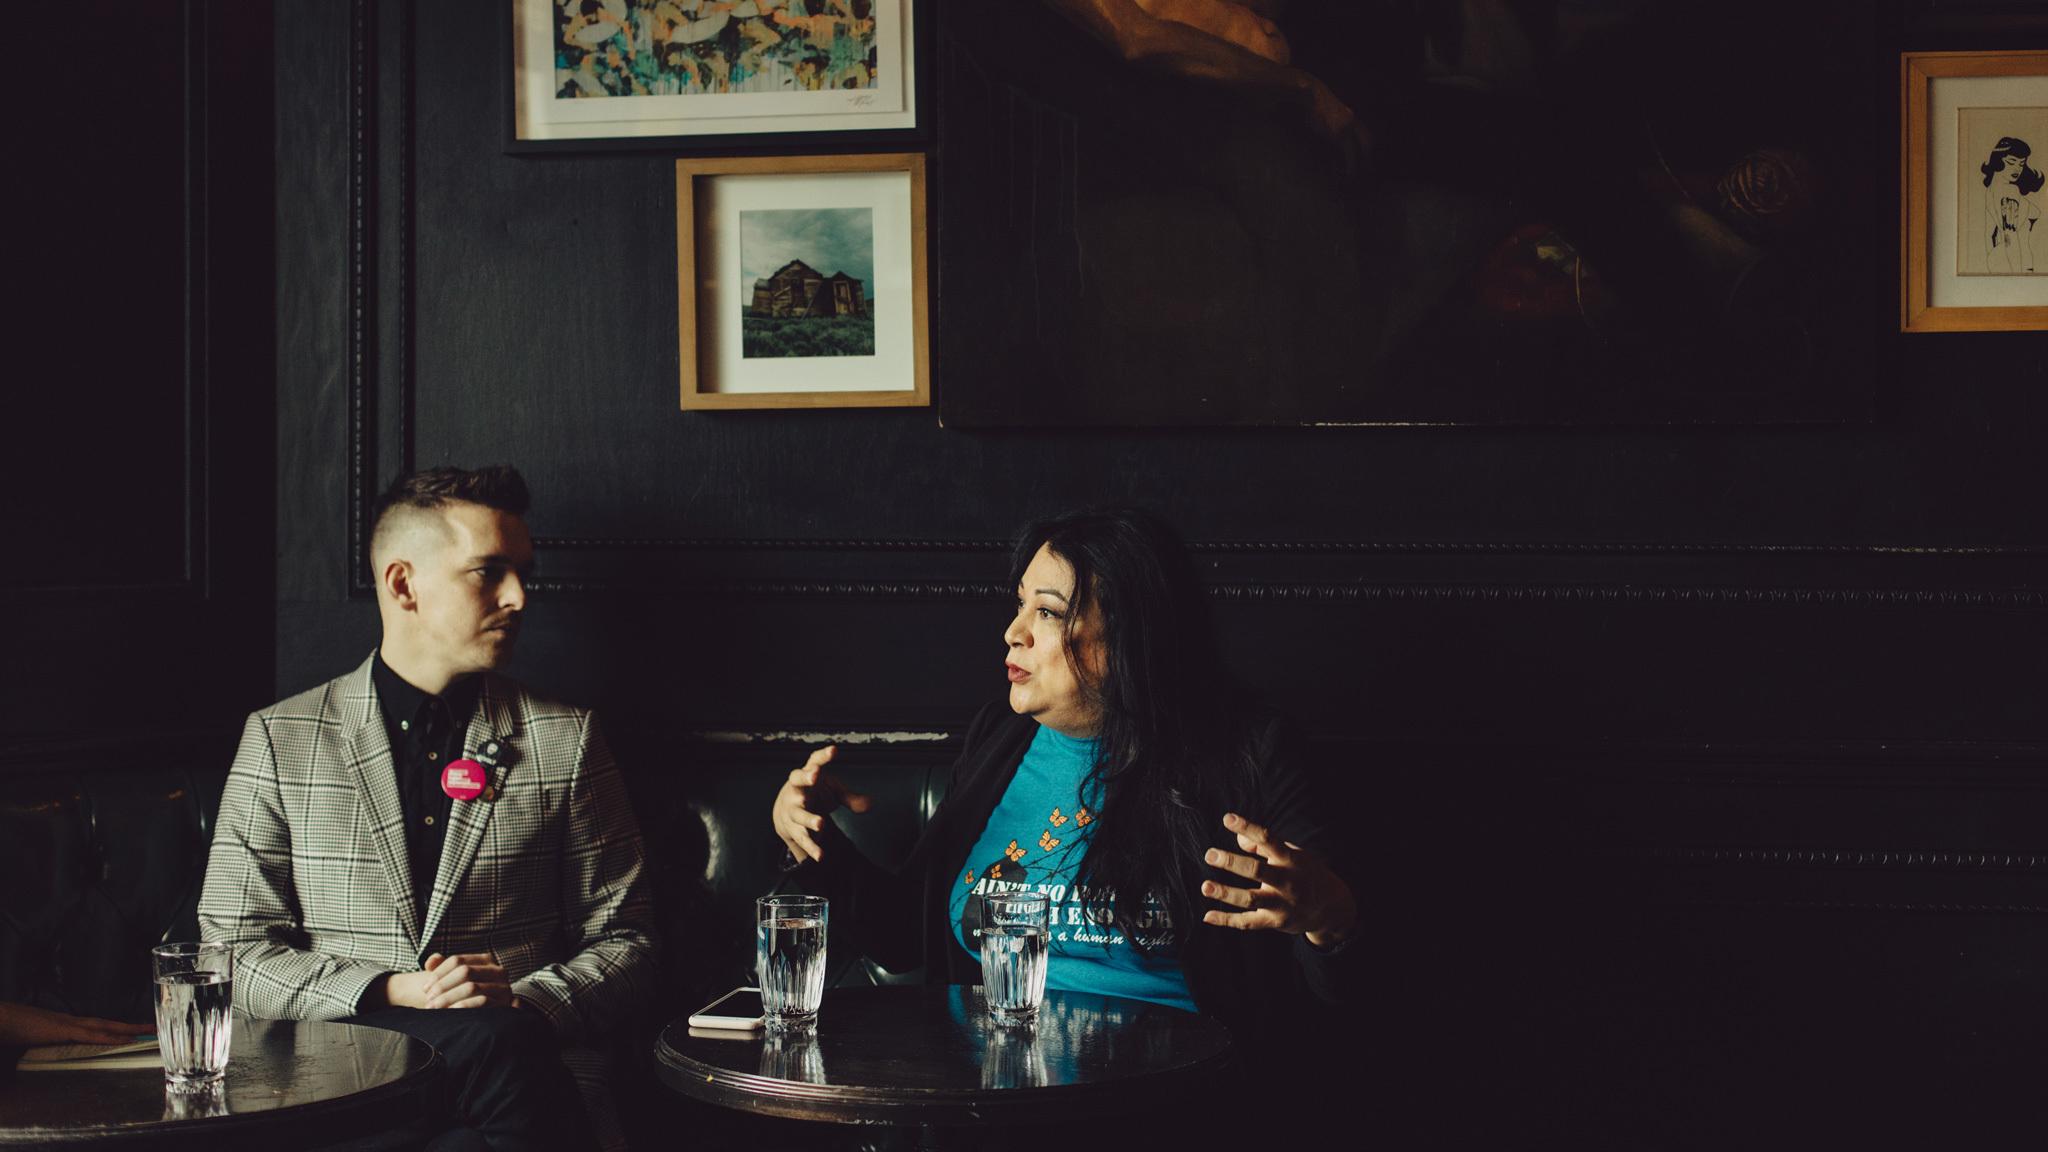 A conversation between two local LGBTQ activists in anticipation of LA Pride